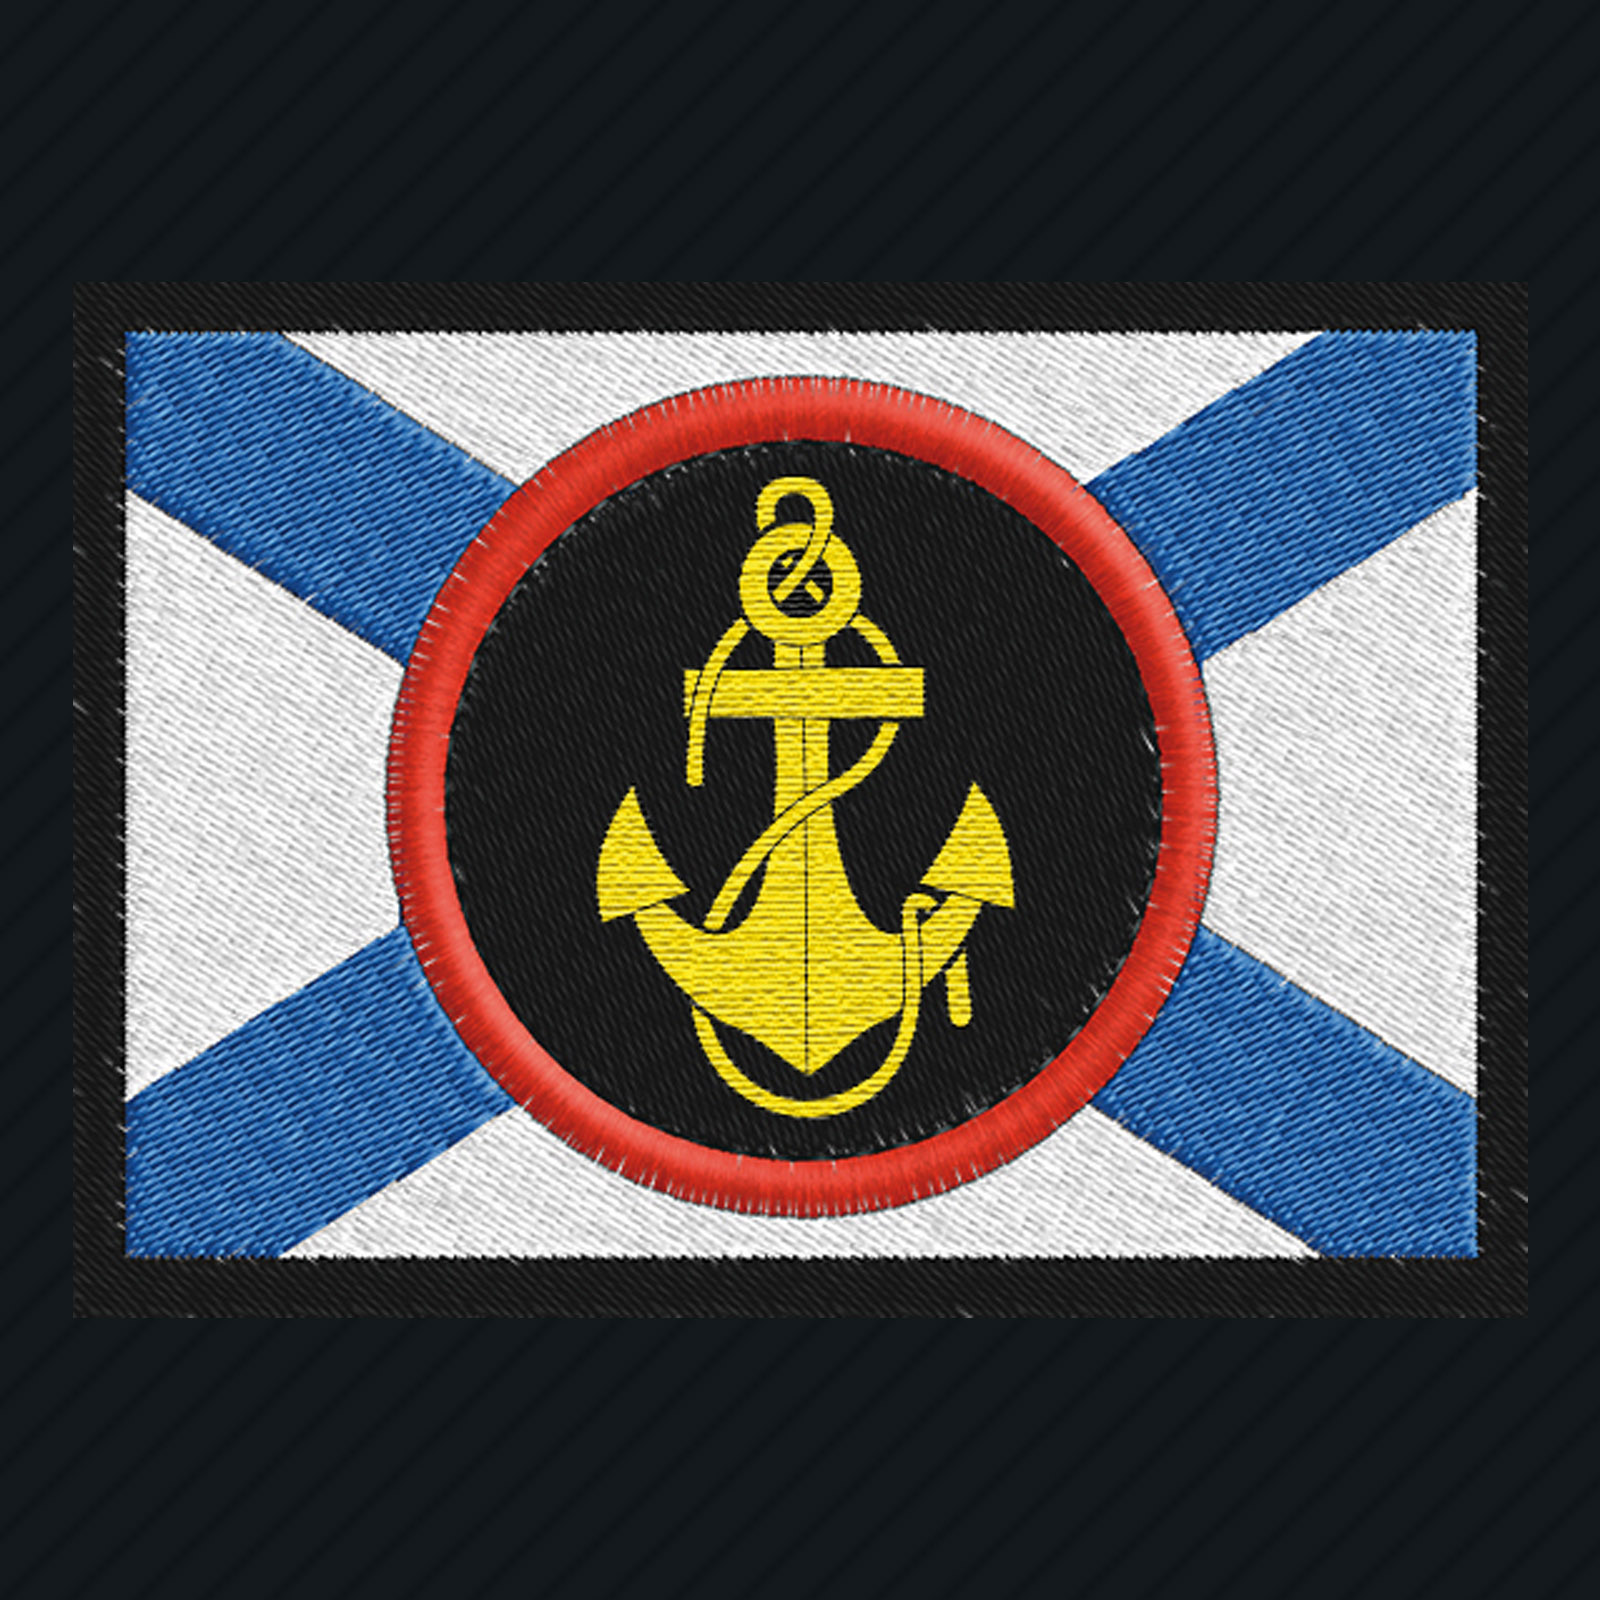 Тёмно-синяя кепка с нашивкой морской пехоты